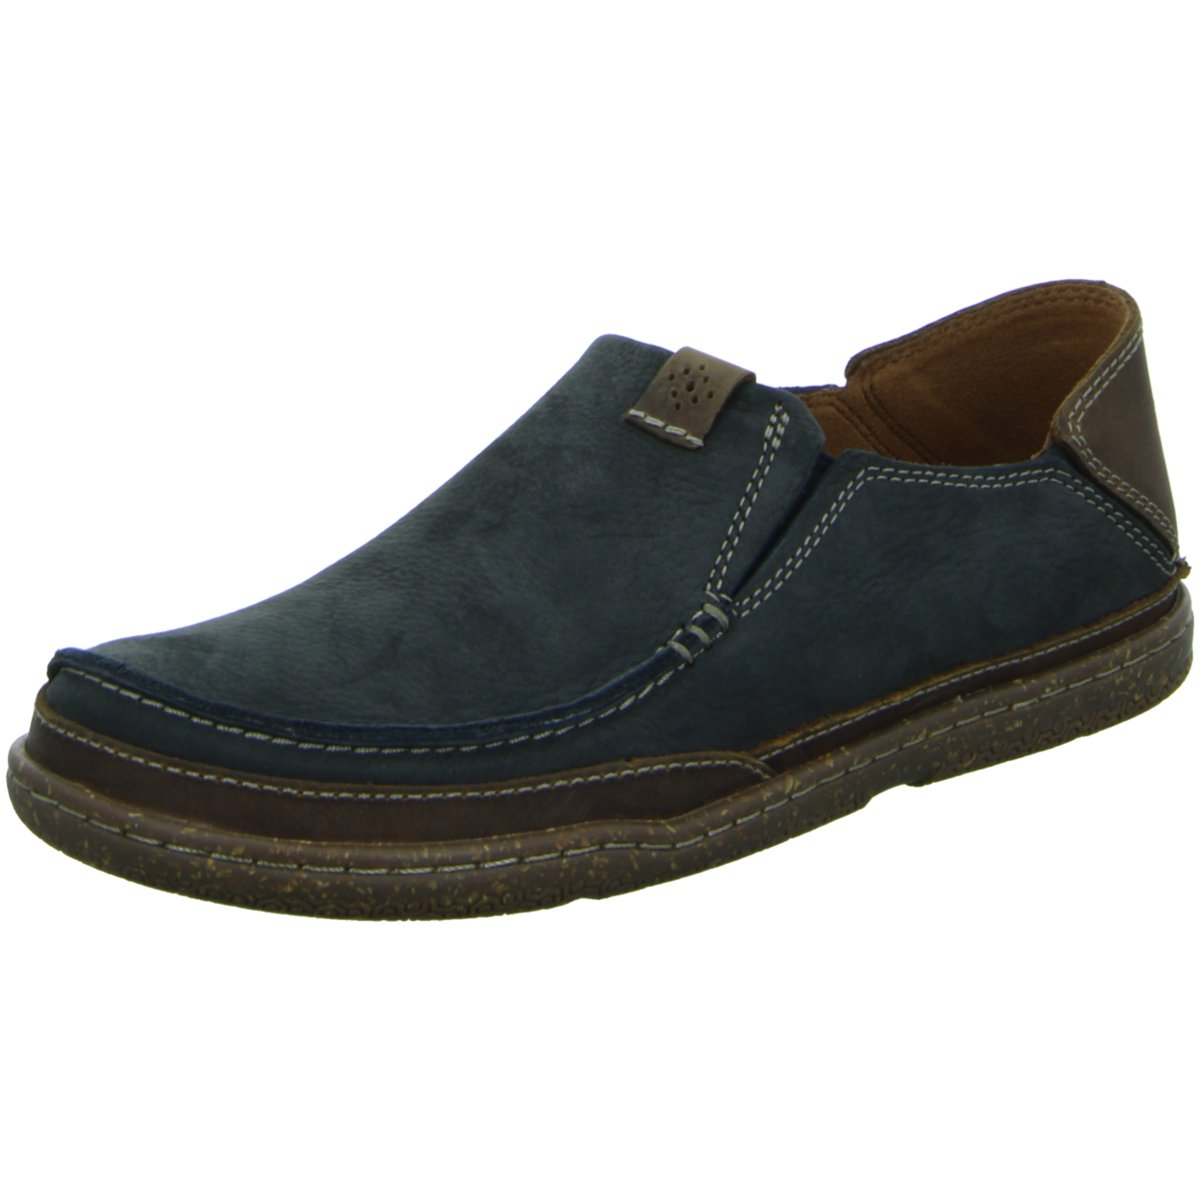 NEU Clarks Herren Slipper Slipper Halbschuh Trapell Form 26115059 7 090 blau